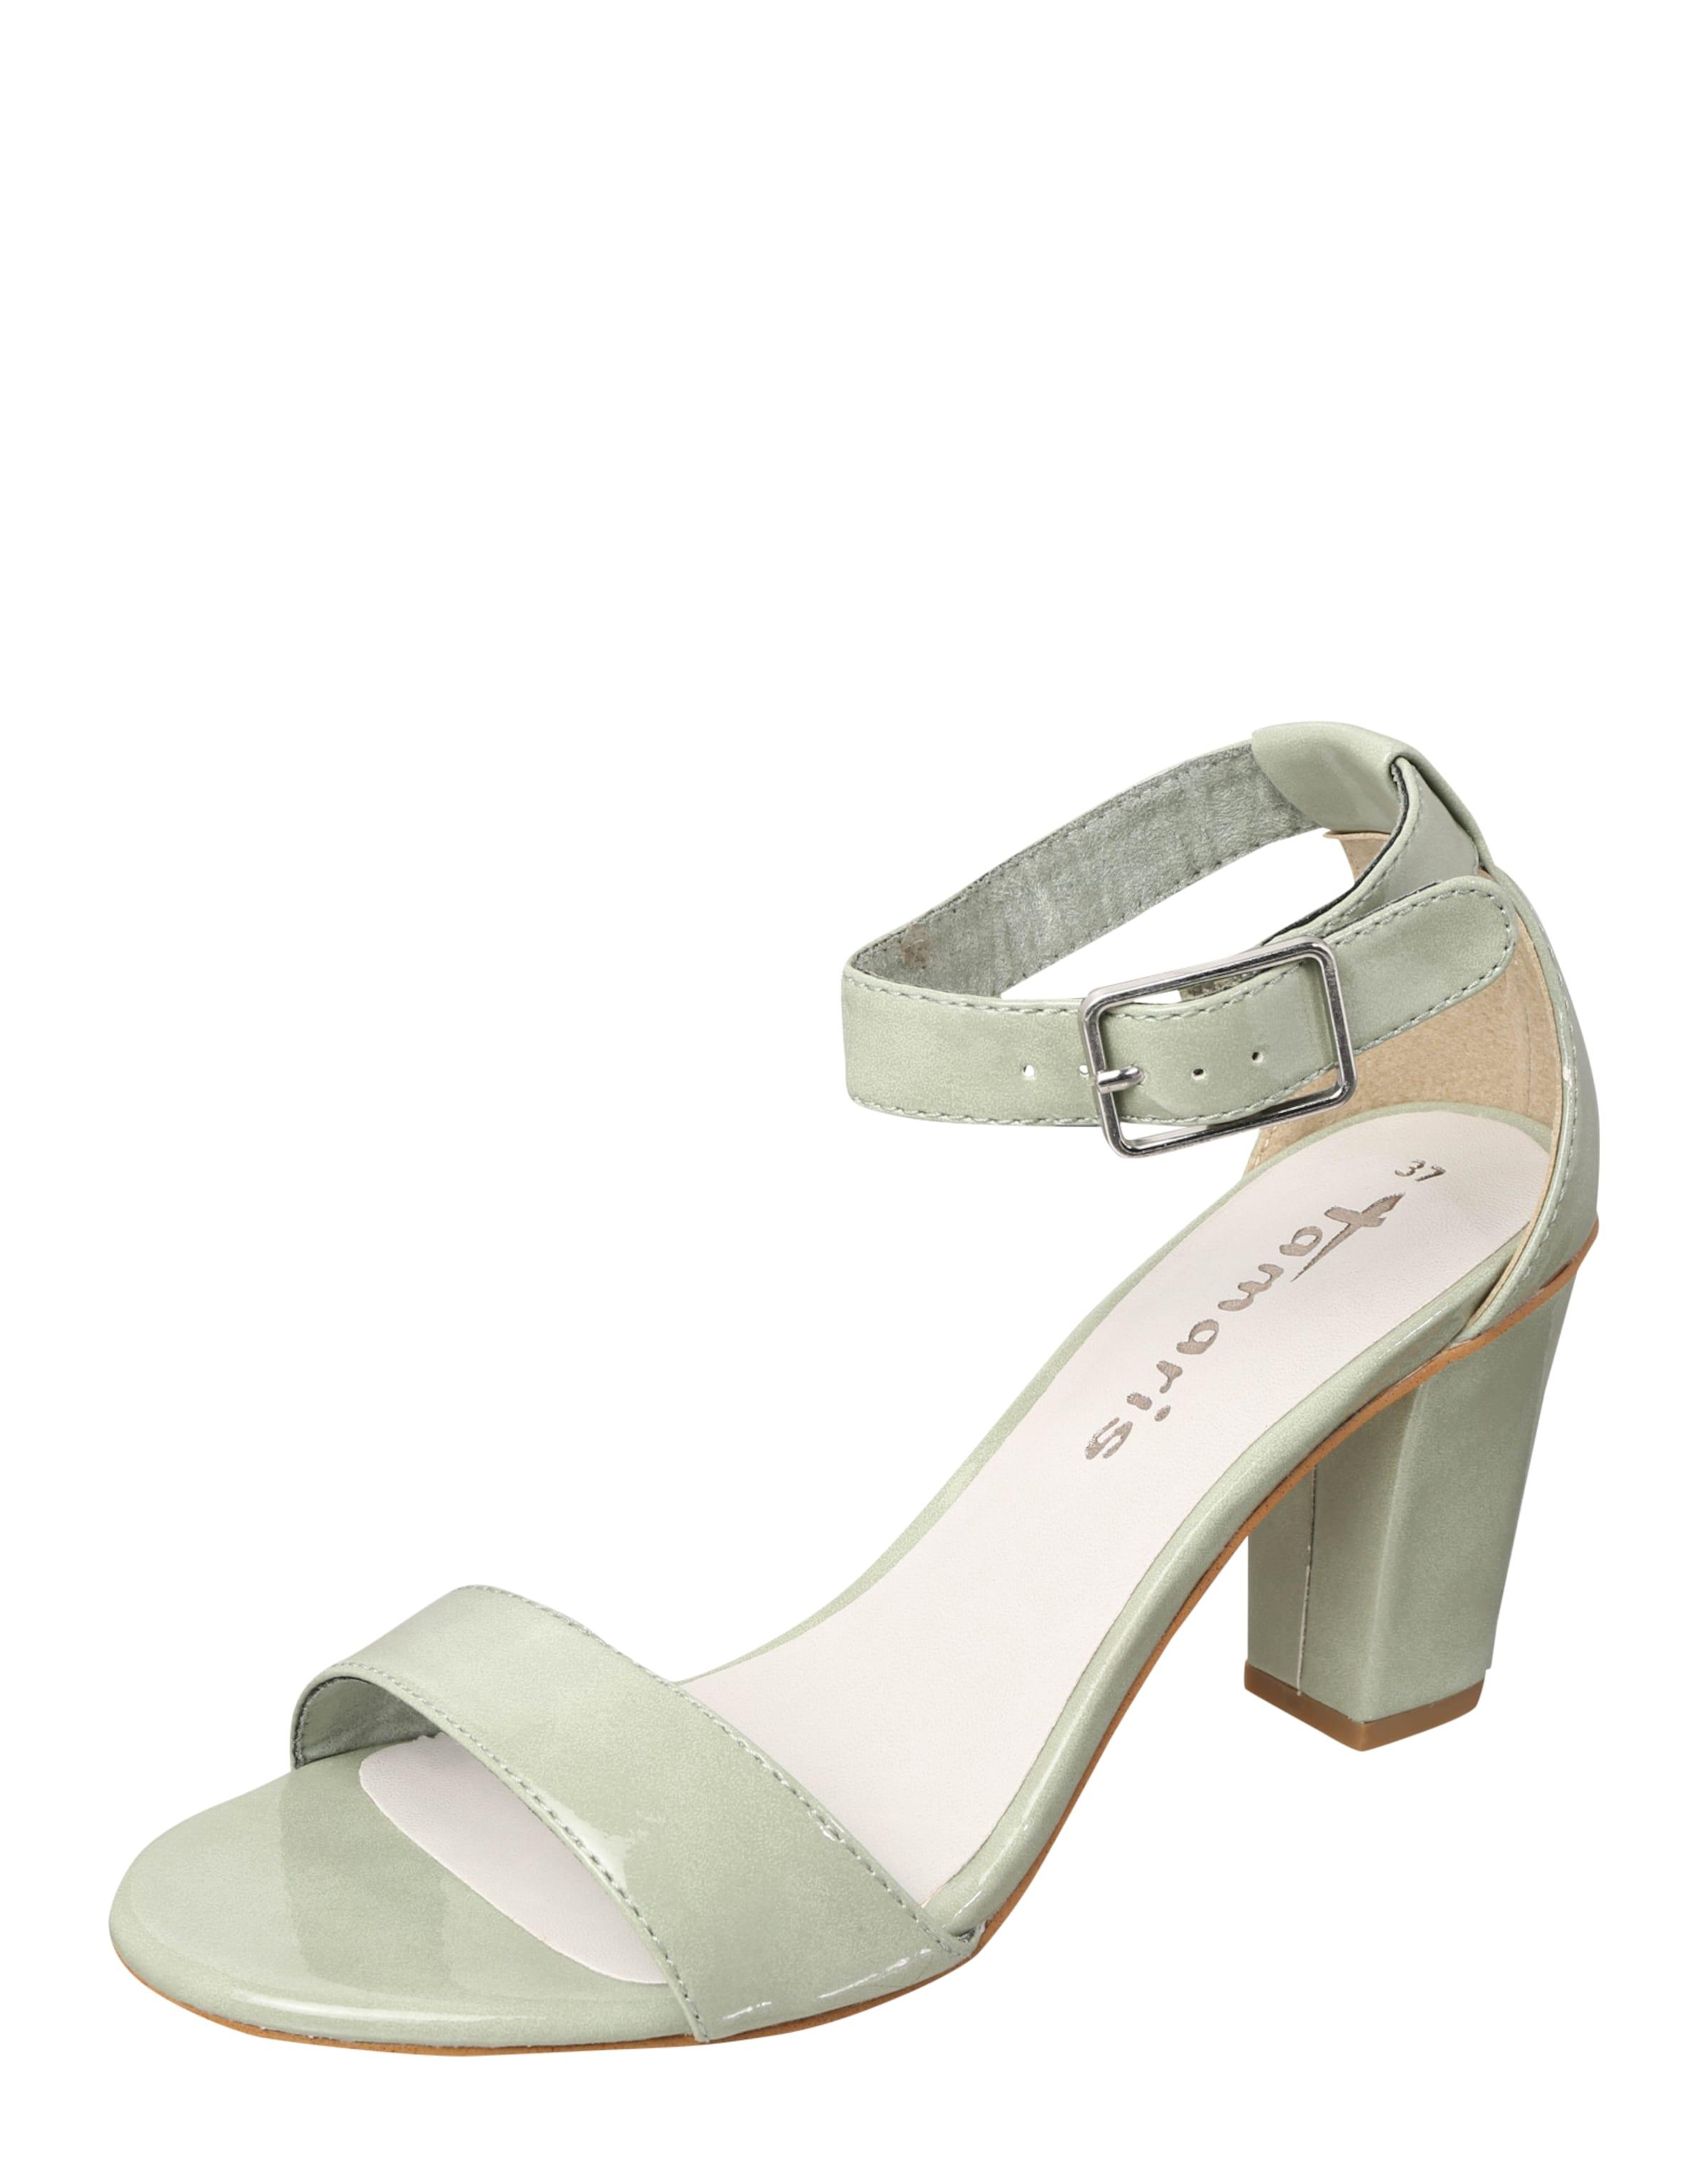 TAMARIS Sandalette in Lack-Optik Rabatt Komfortabel HGbLYz